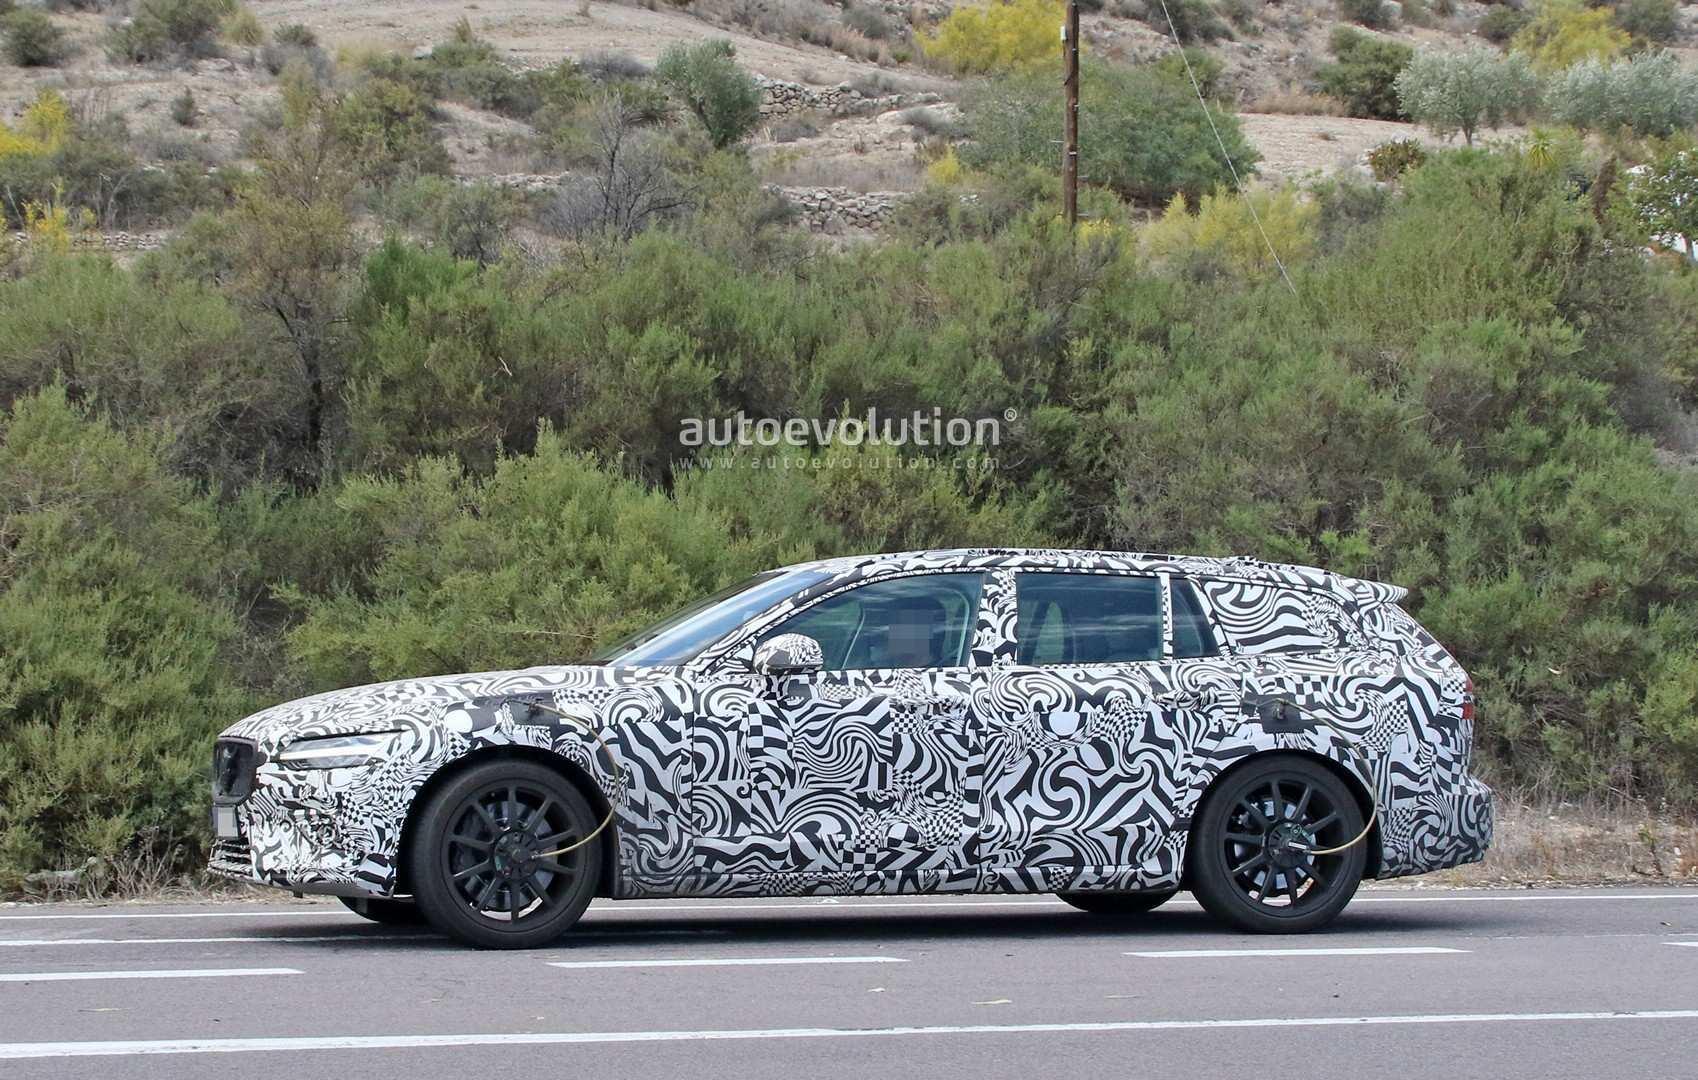 91 Great Volvo Wagon 2020 Rumors for Volvo Wagon 2020